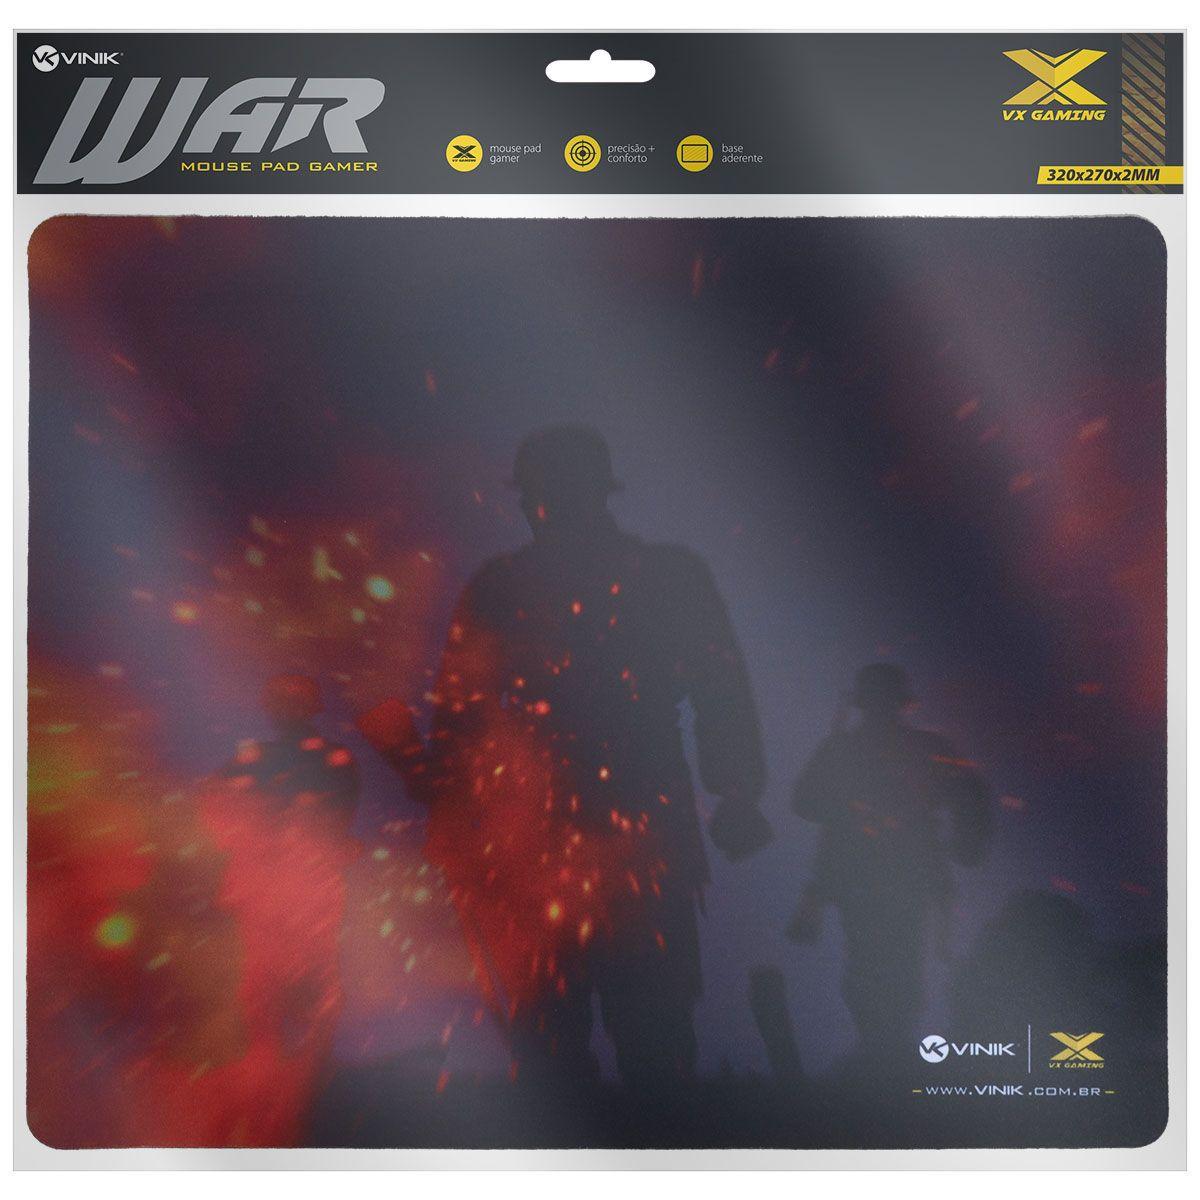 MOUSE PAD VX GAMING VINIK WAR - 320X270X2MM